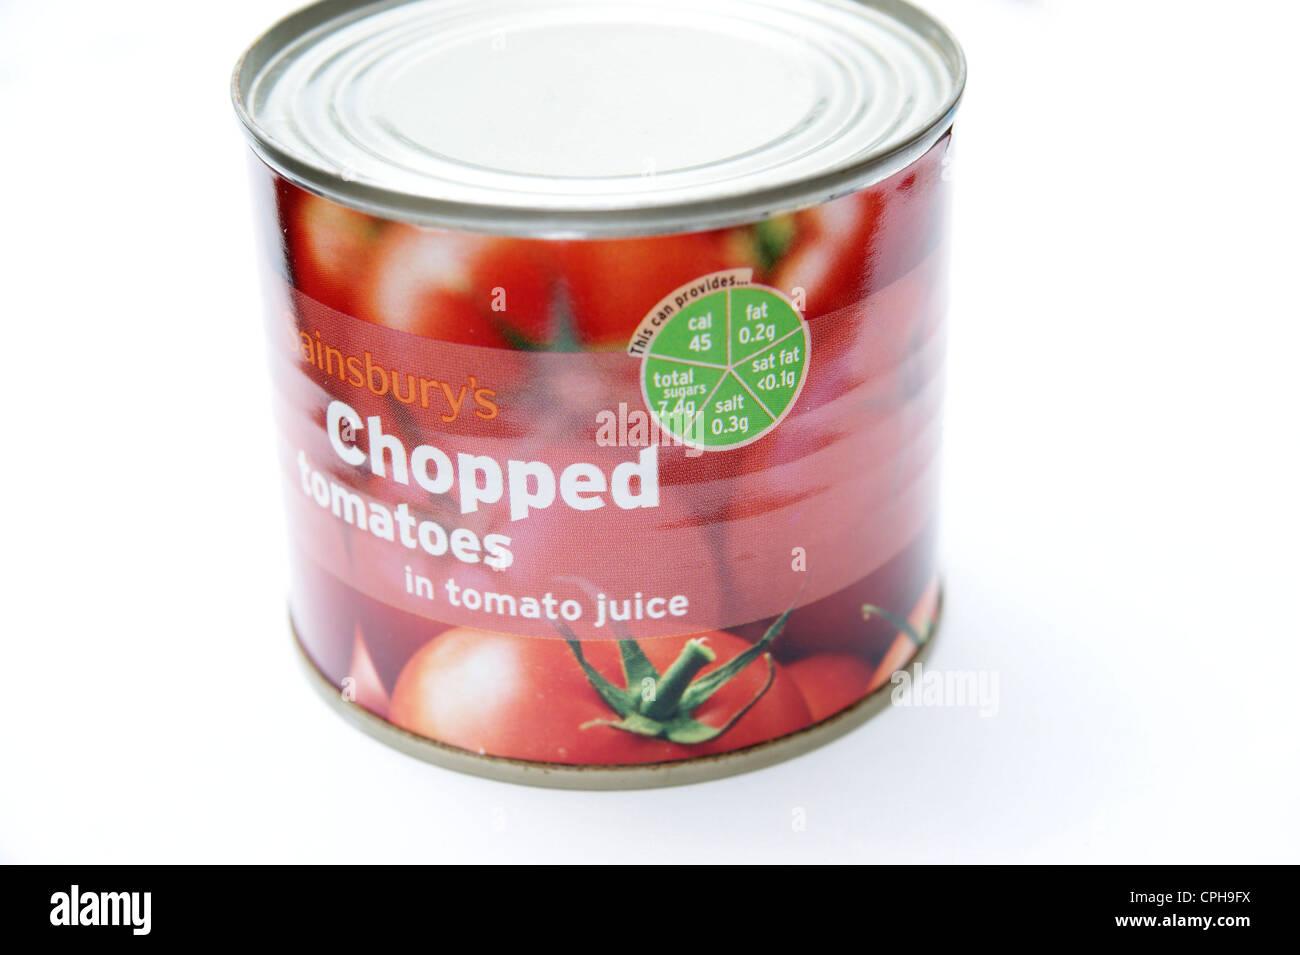 Sistema de luces de tráfico de información nutricional directrices sobre una lata de tomates picados Sainsbury's Imagen De Stock